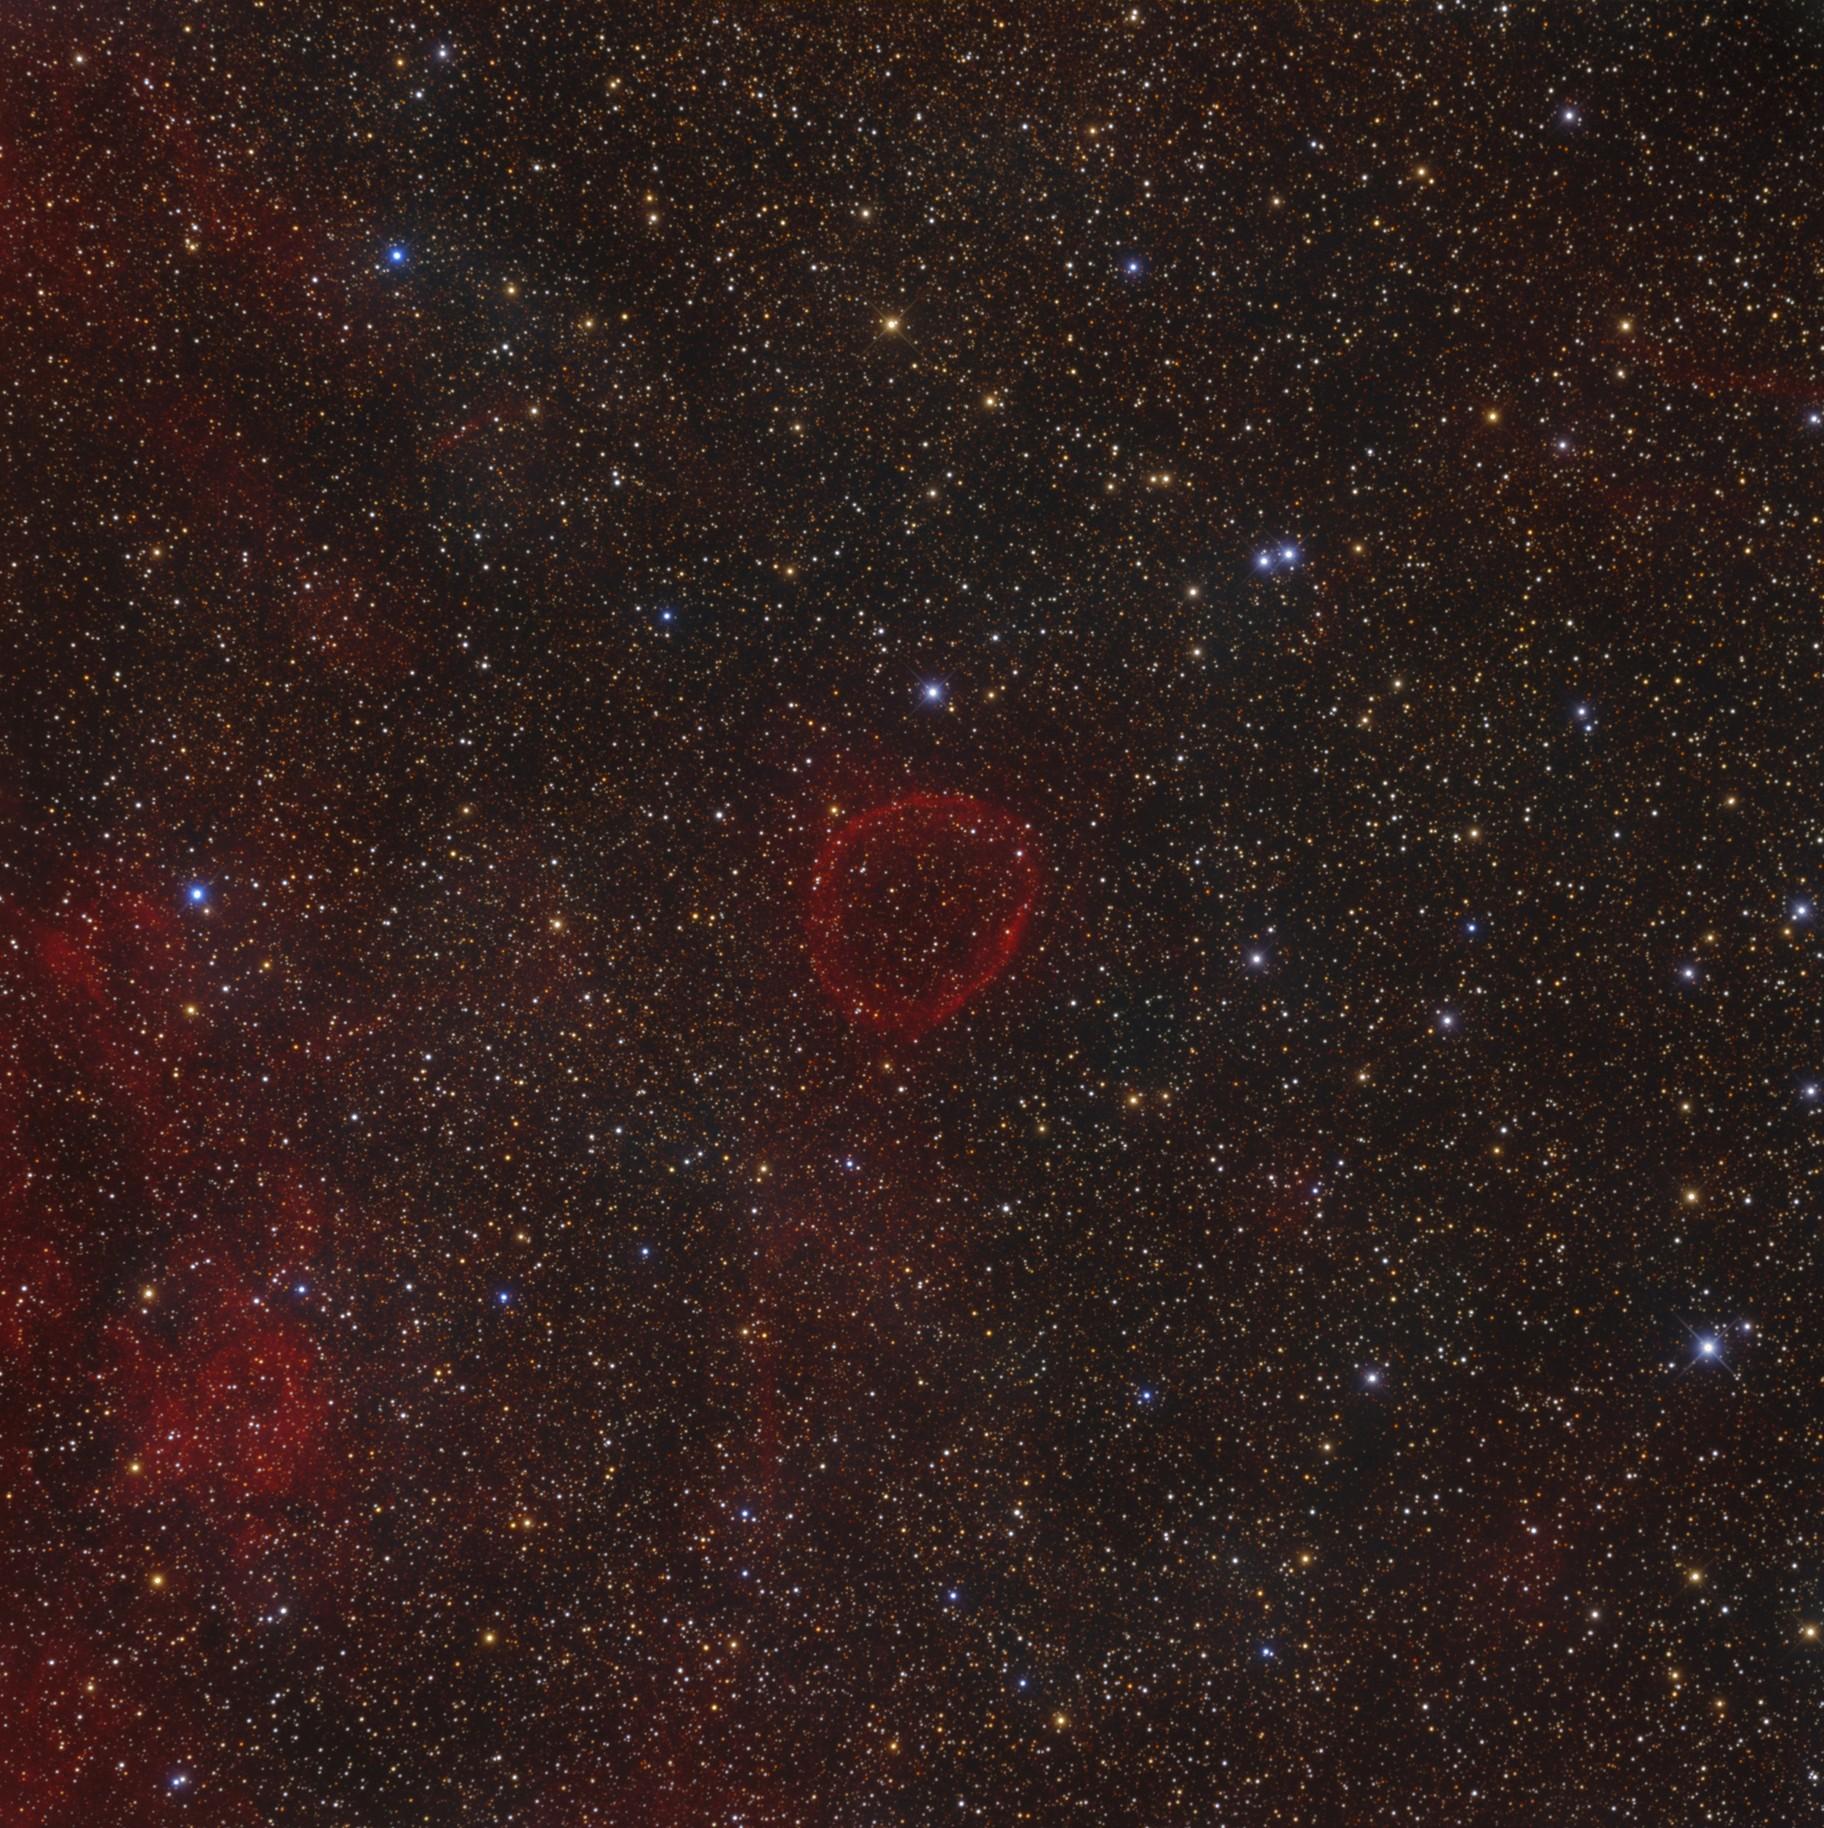 NEW DISCOVERY: Dr15 (Drechsler 15) in Centaurus